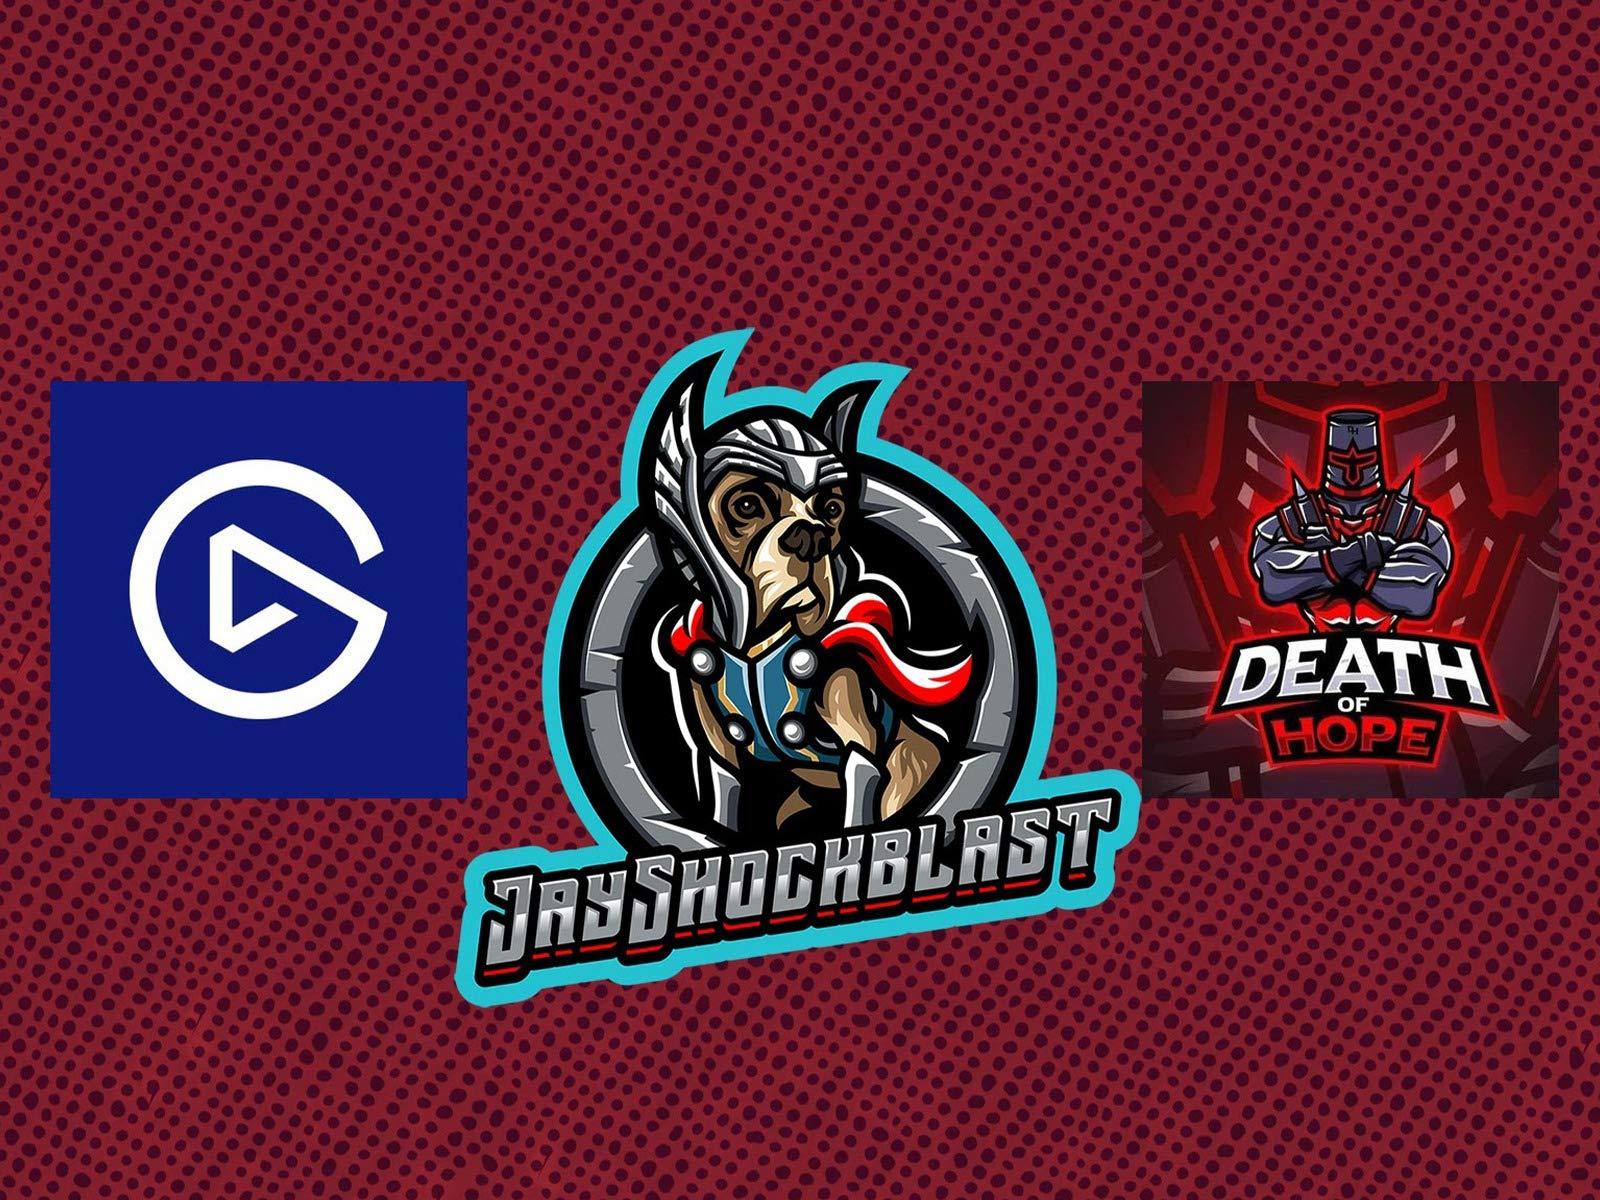 Clip: Jayshockblast on Amazon Prime Video UK